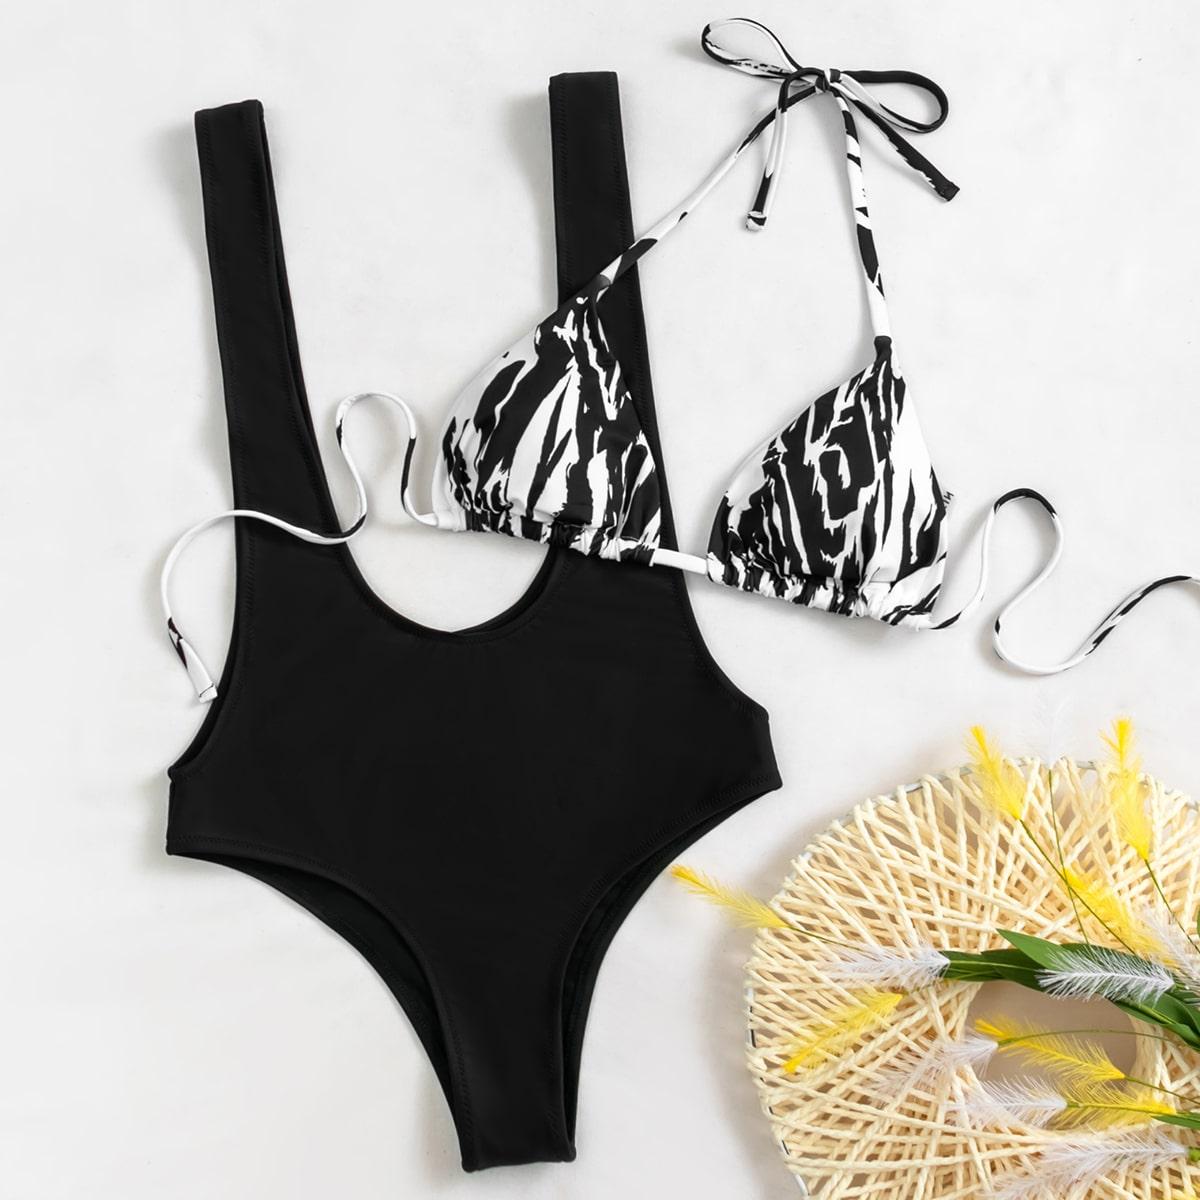 SHEIN / Graphic Print Triangle Suspender Bikini Swimsuit